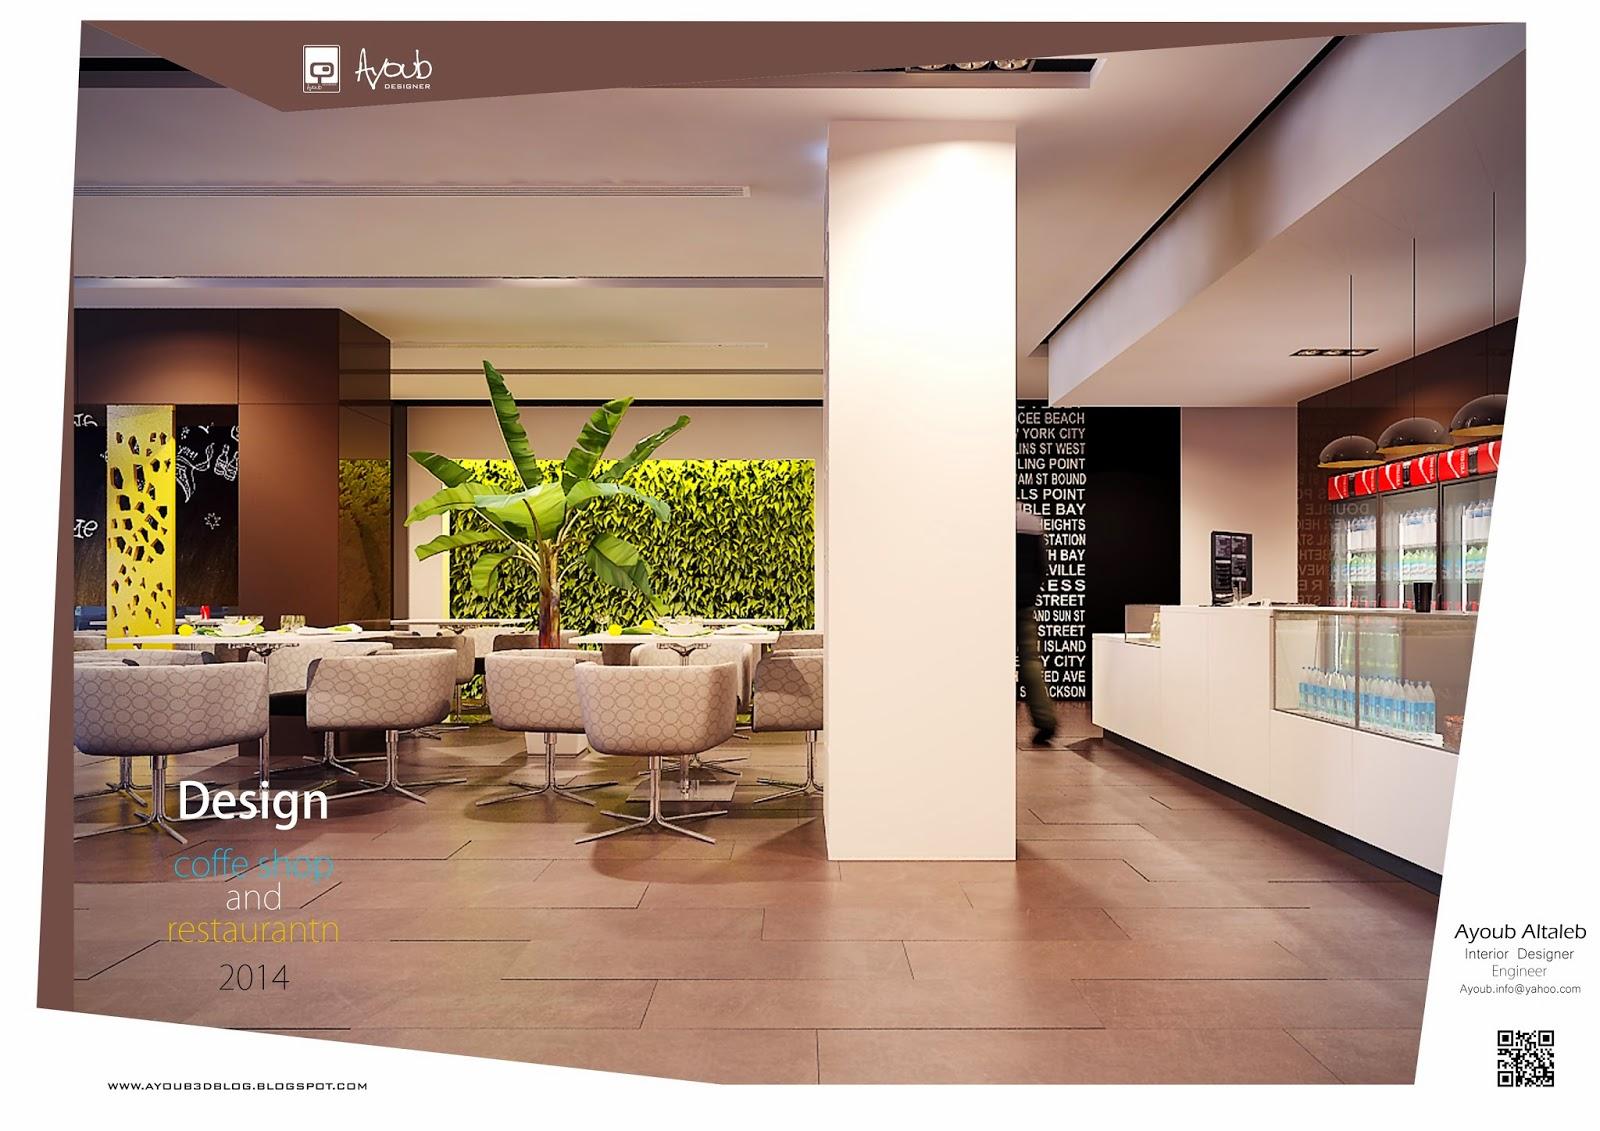 I Create Design And Rendering Coffee Shop Nebras This Year 2014 Tripoli   Libya